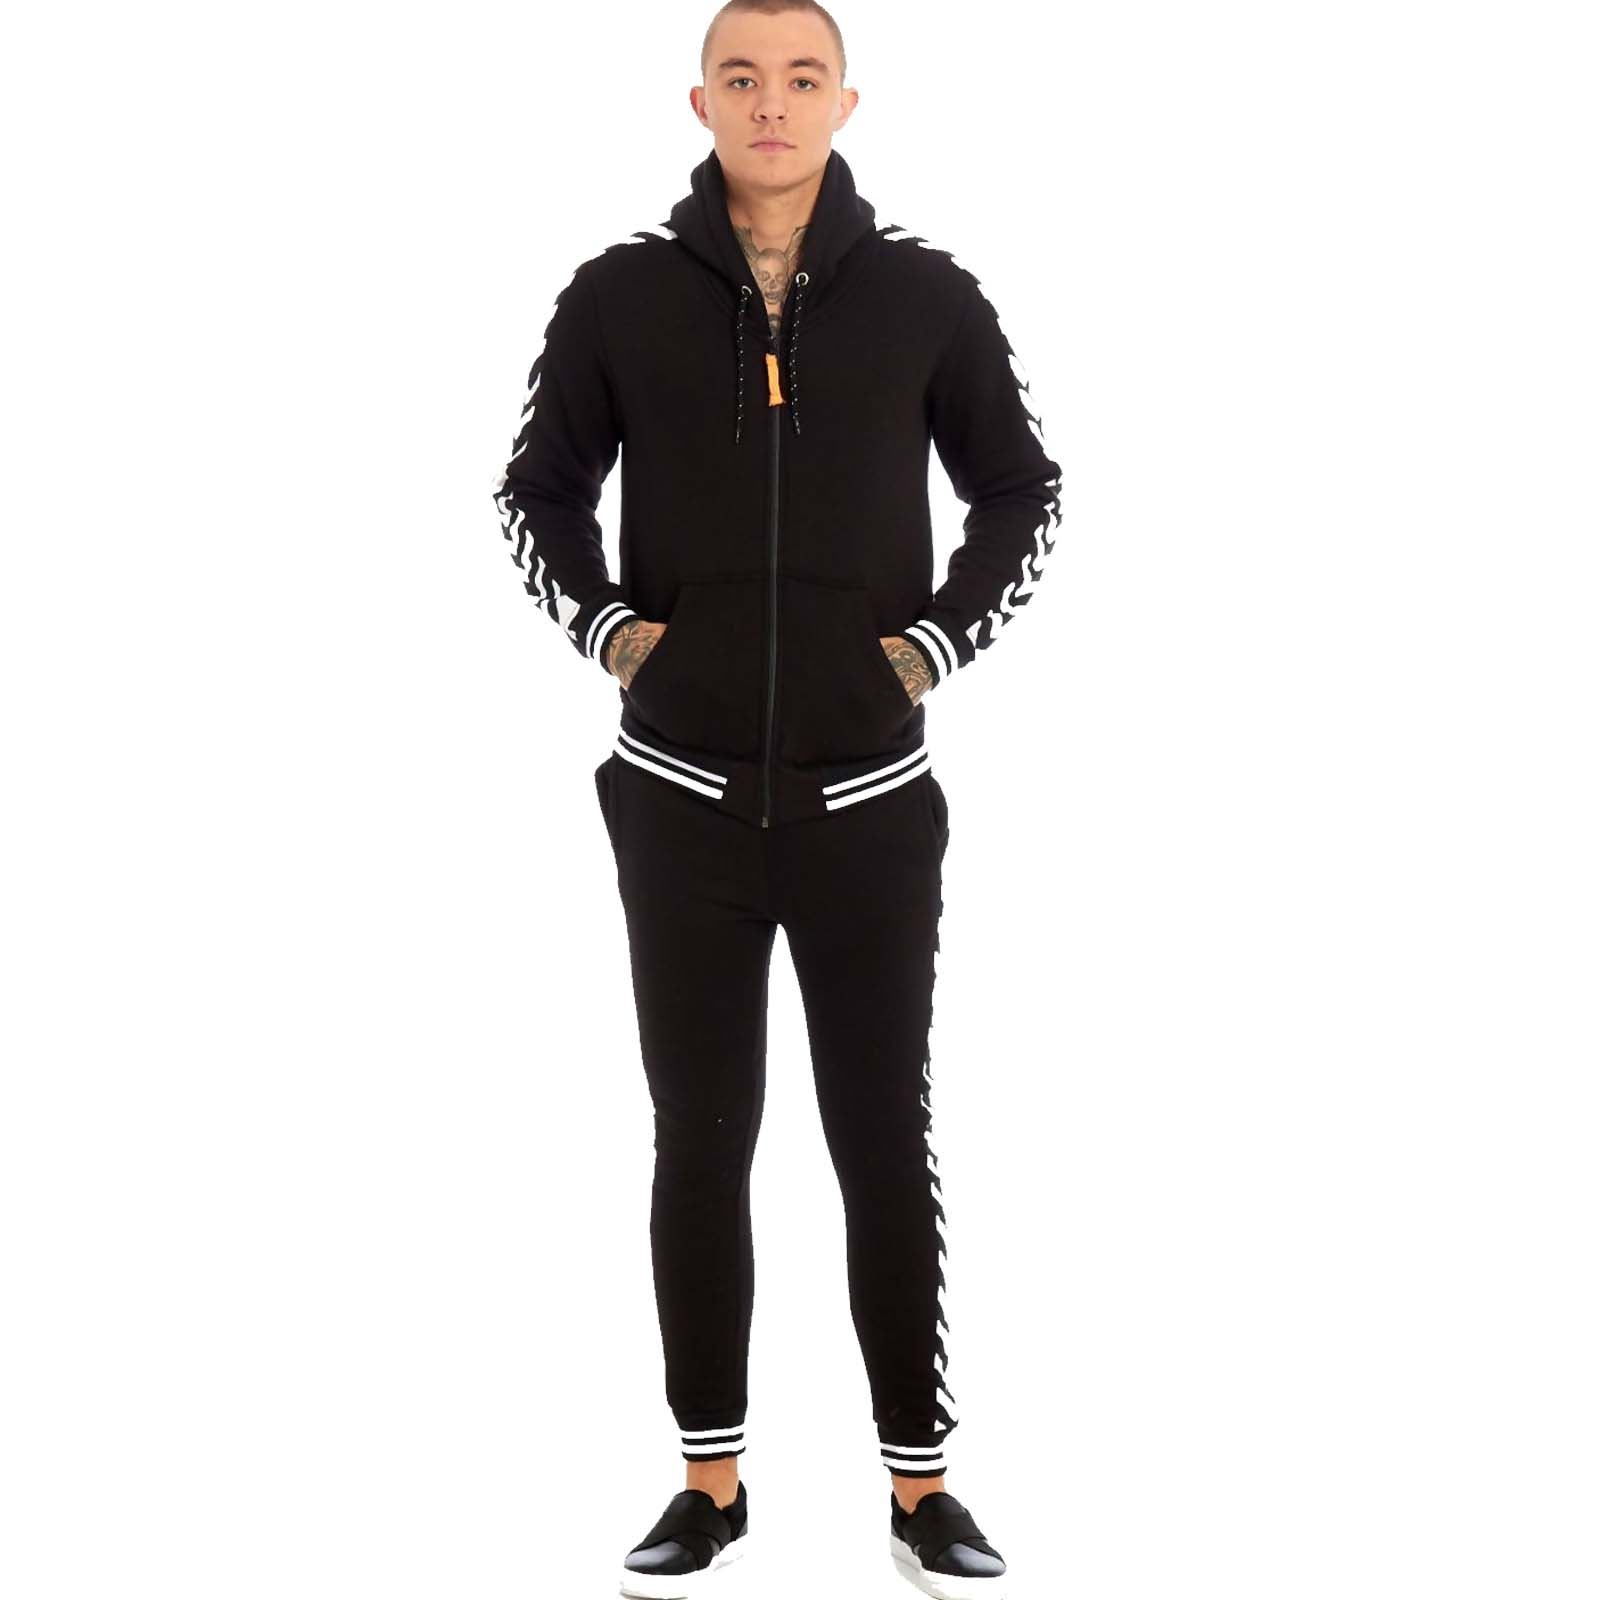 Mens Hooded Gym Fitness Sports Skinny Joggers Herringbone Full Tracksuit Set 2Pc